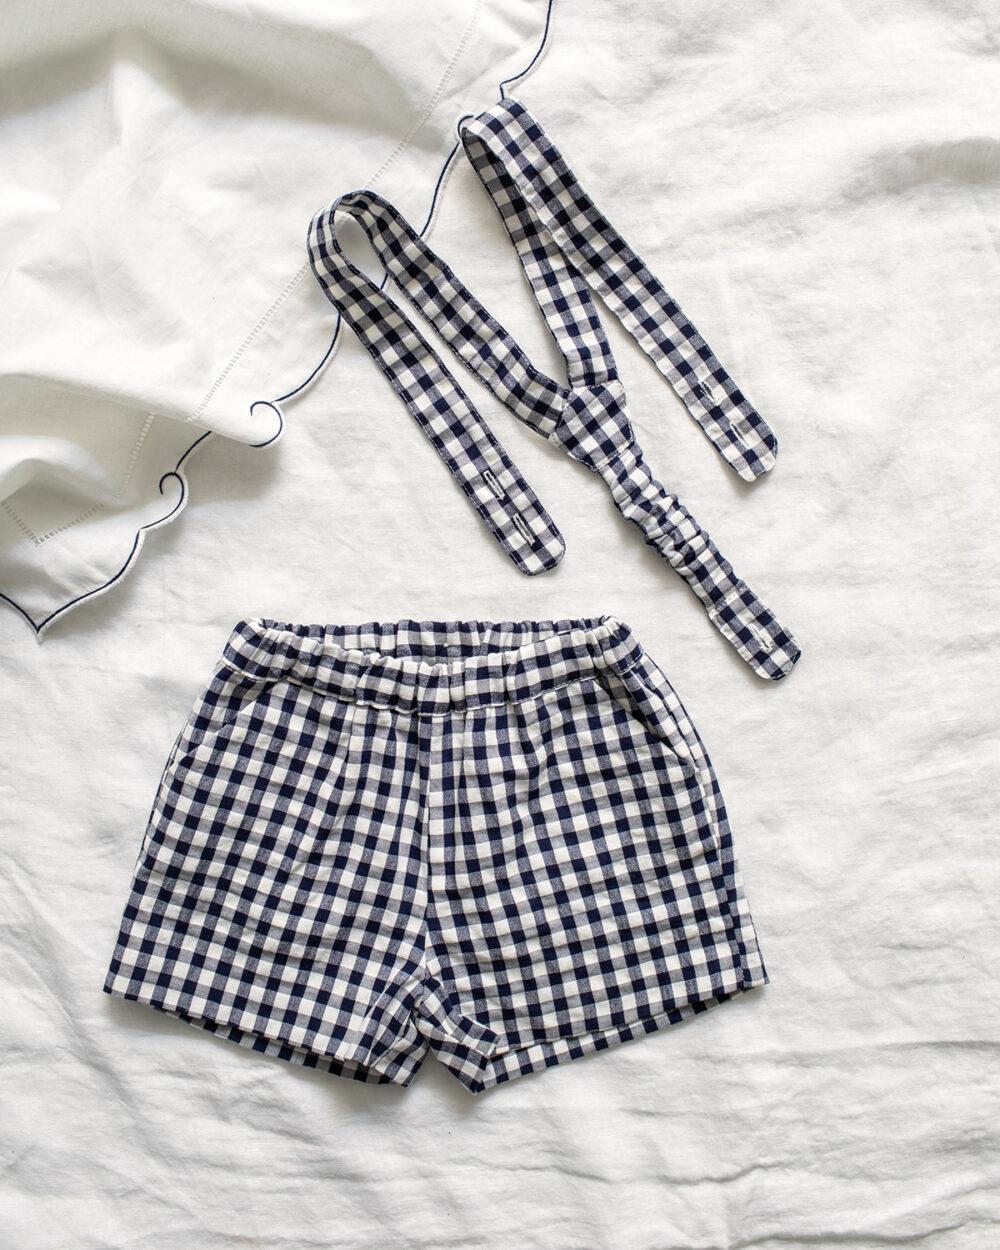 Pantalon Corto Tirantes Vichy Marino de Mi Canesú